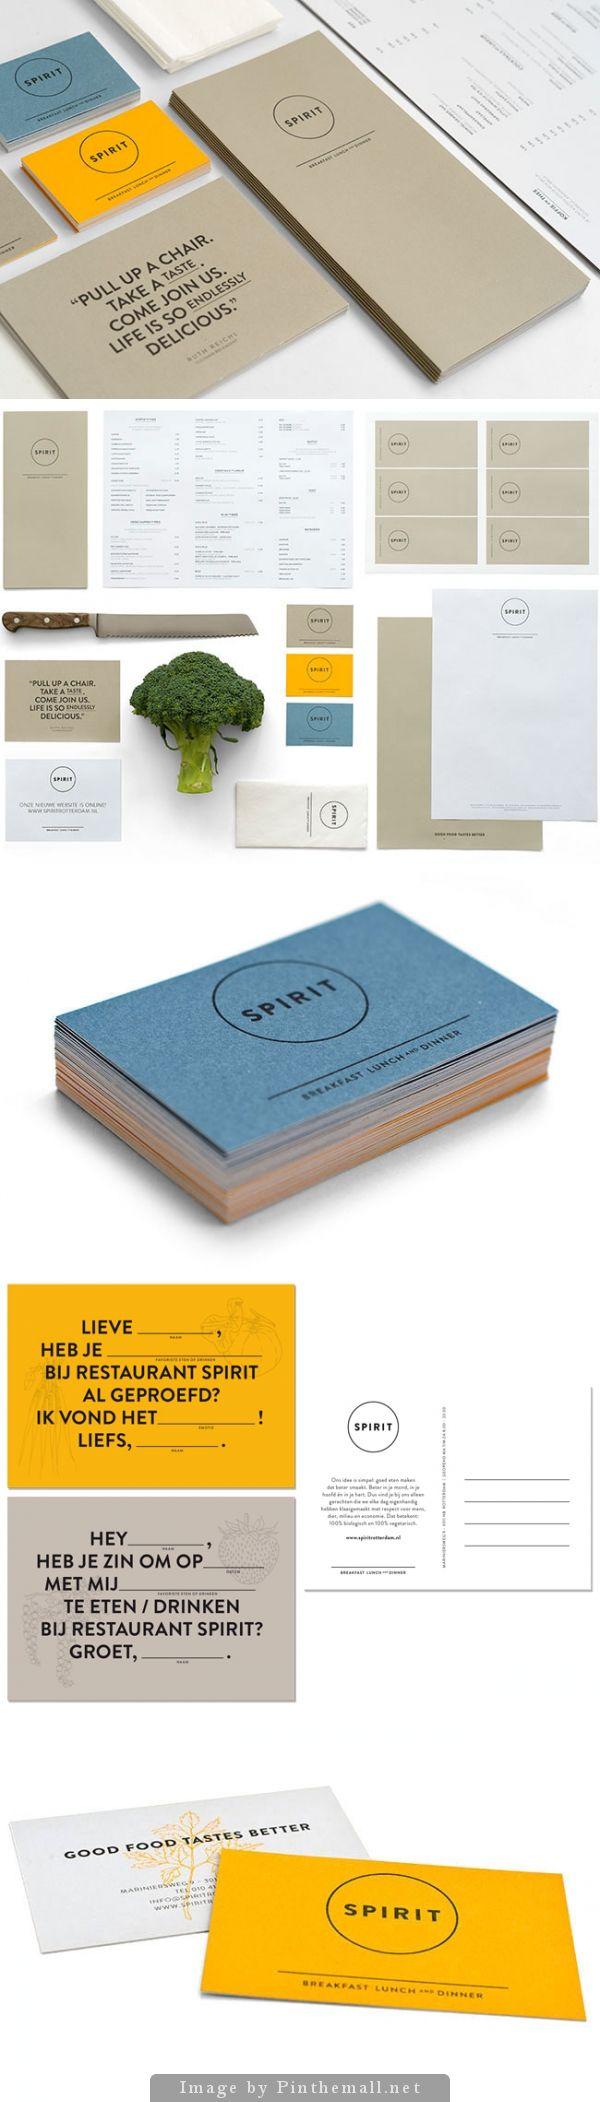 Corporate branding graphic business card menu postcard restaurant minimal colors design